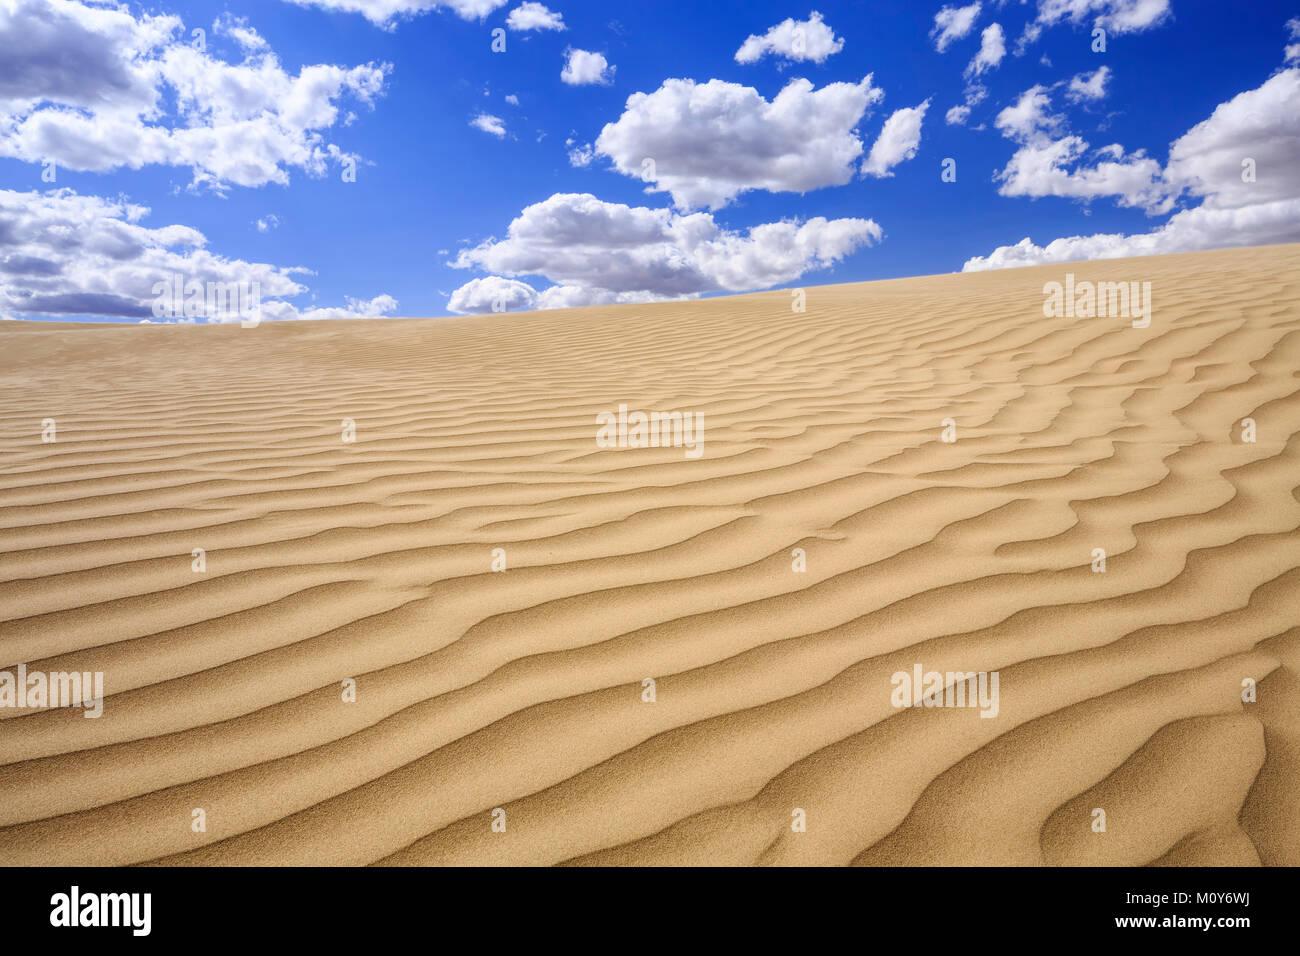 The Great Sandhills, near Sceptre, Saskatchewan, Canada. - Stock Image